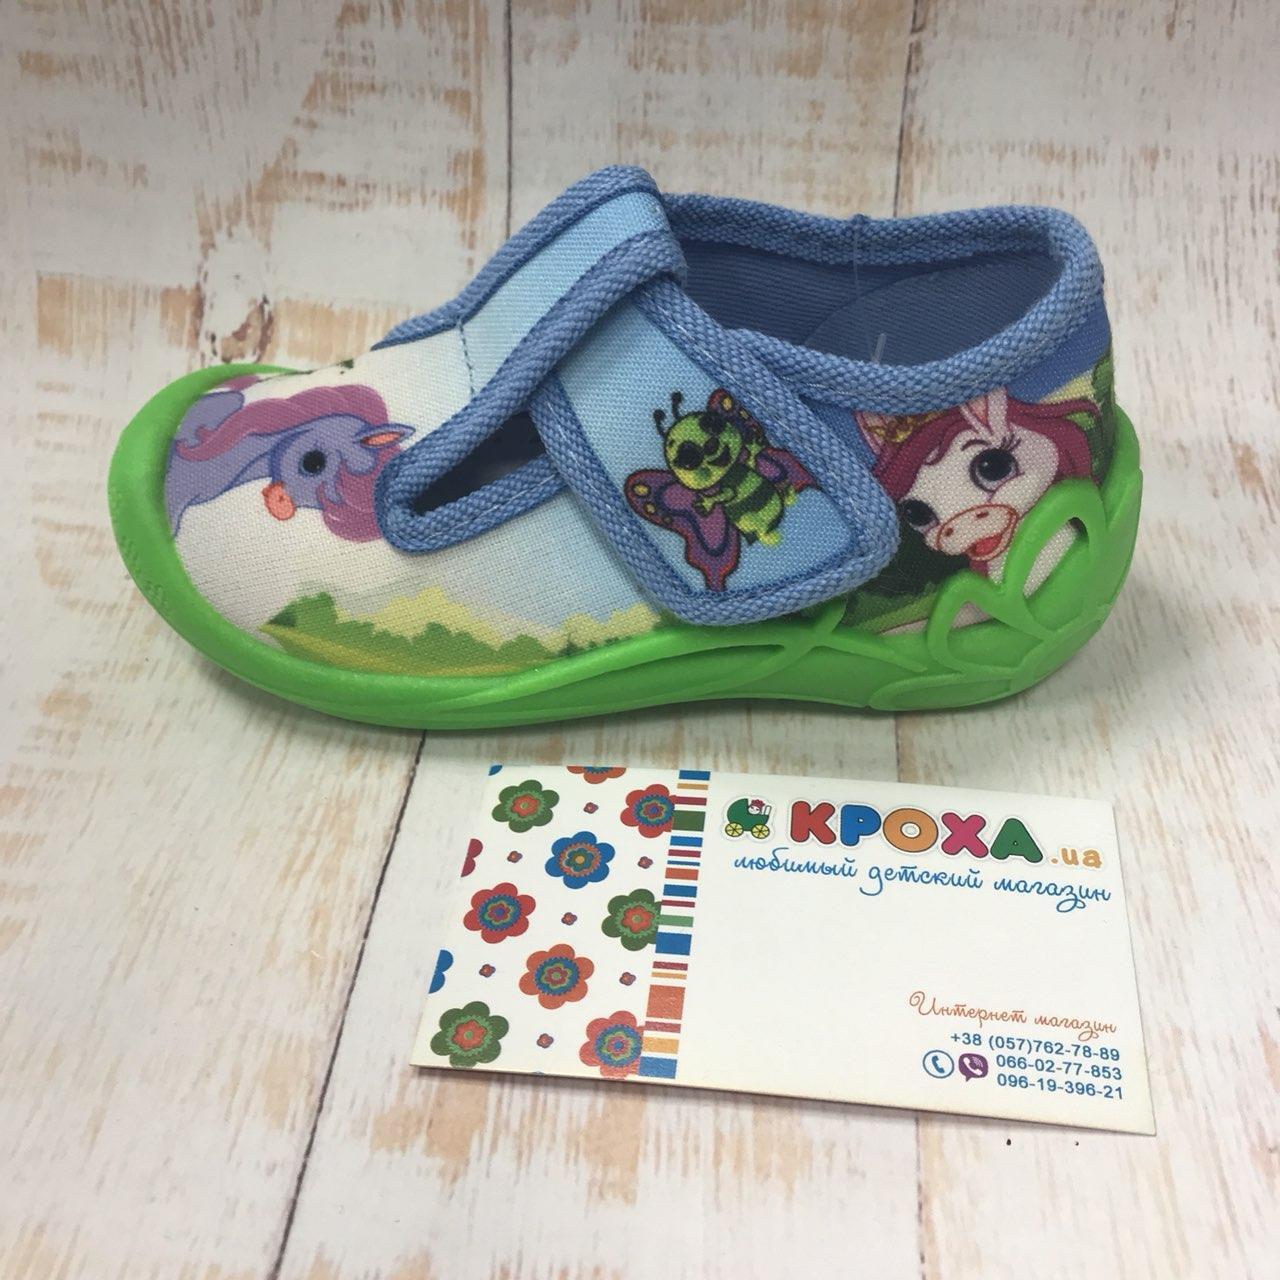 Детские тапочки для девочки Tygrysec голубые (1F8 1) 165078124486e